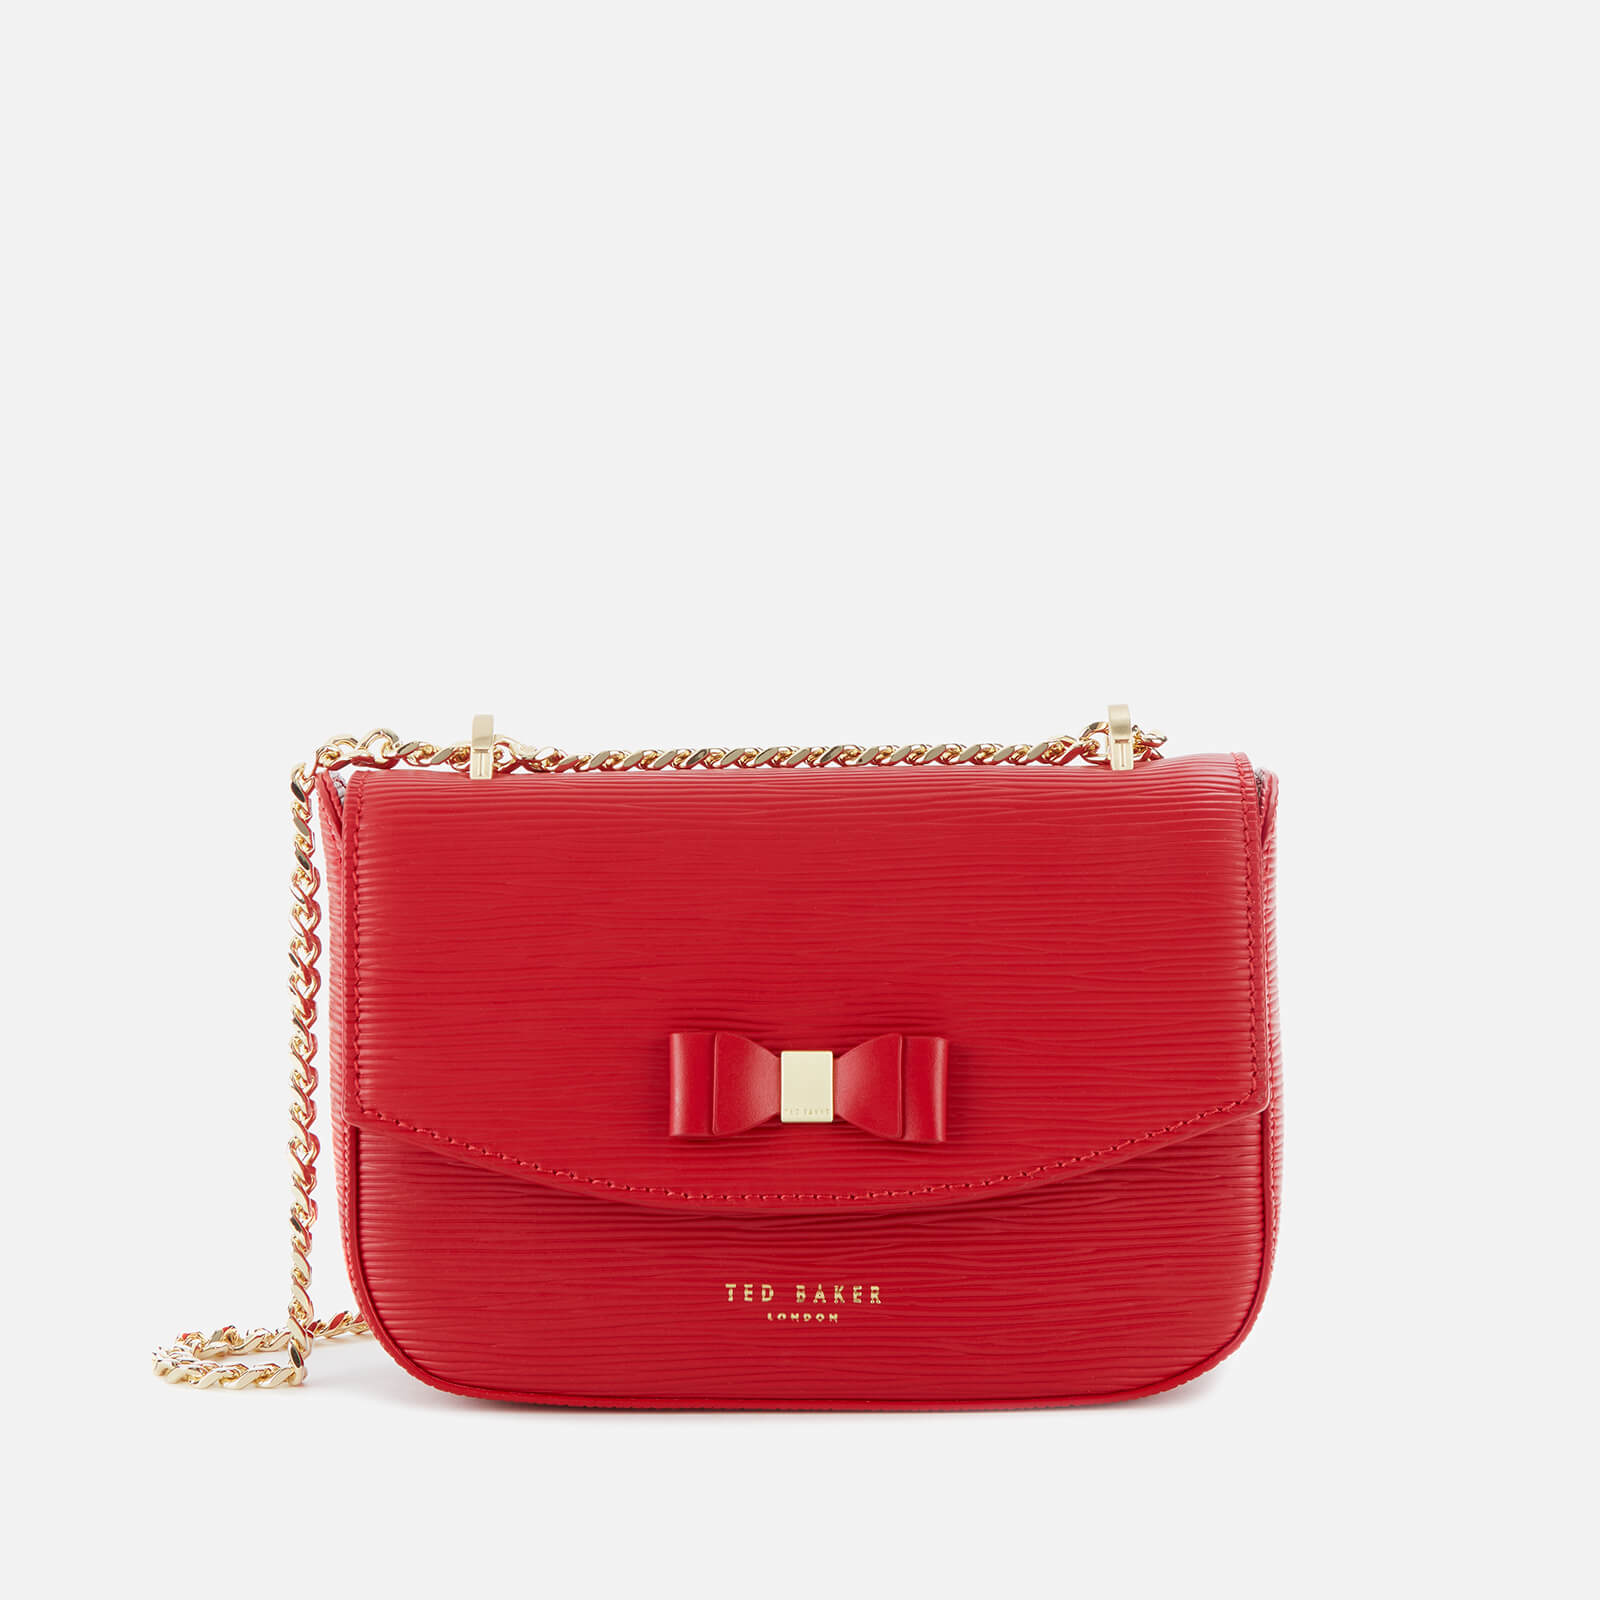 Ted Baker Women's Daissy Bow Mini Shoulder Bag - Red